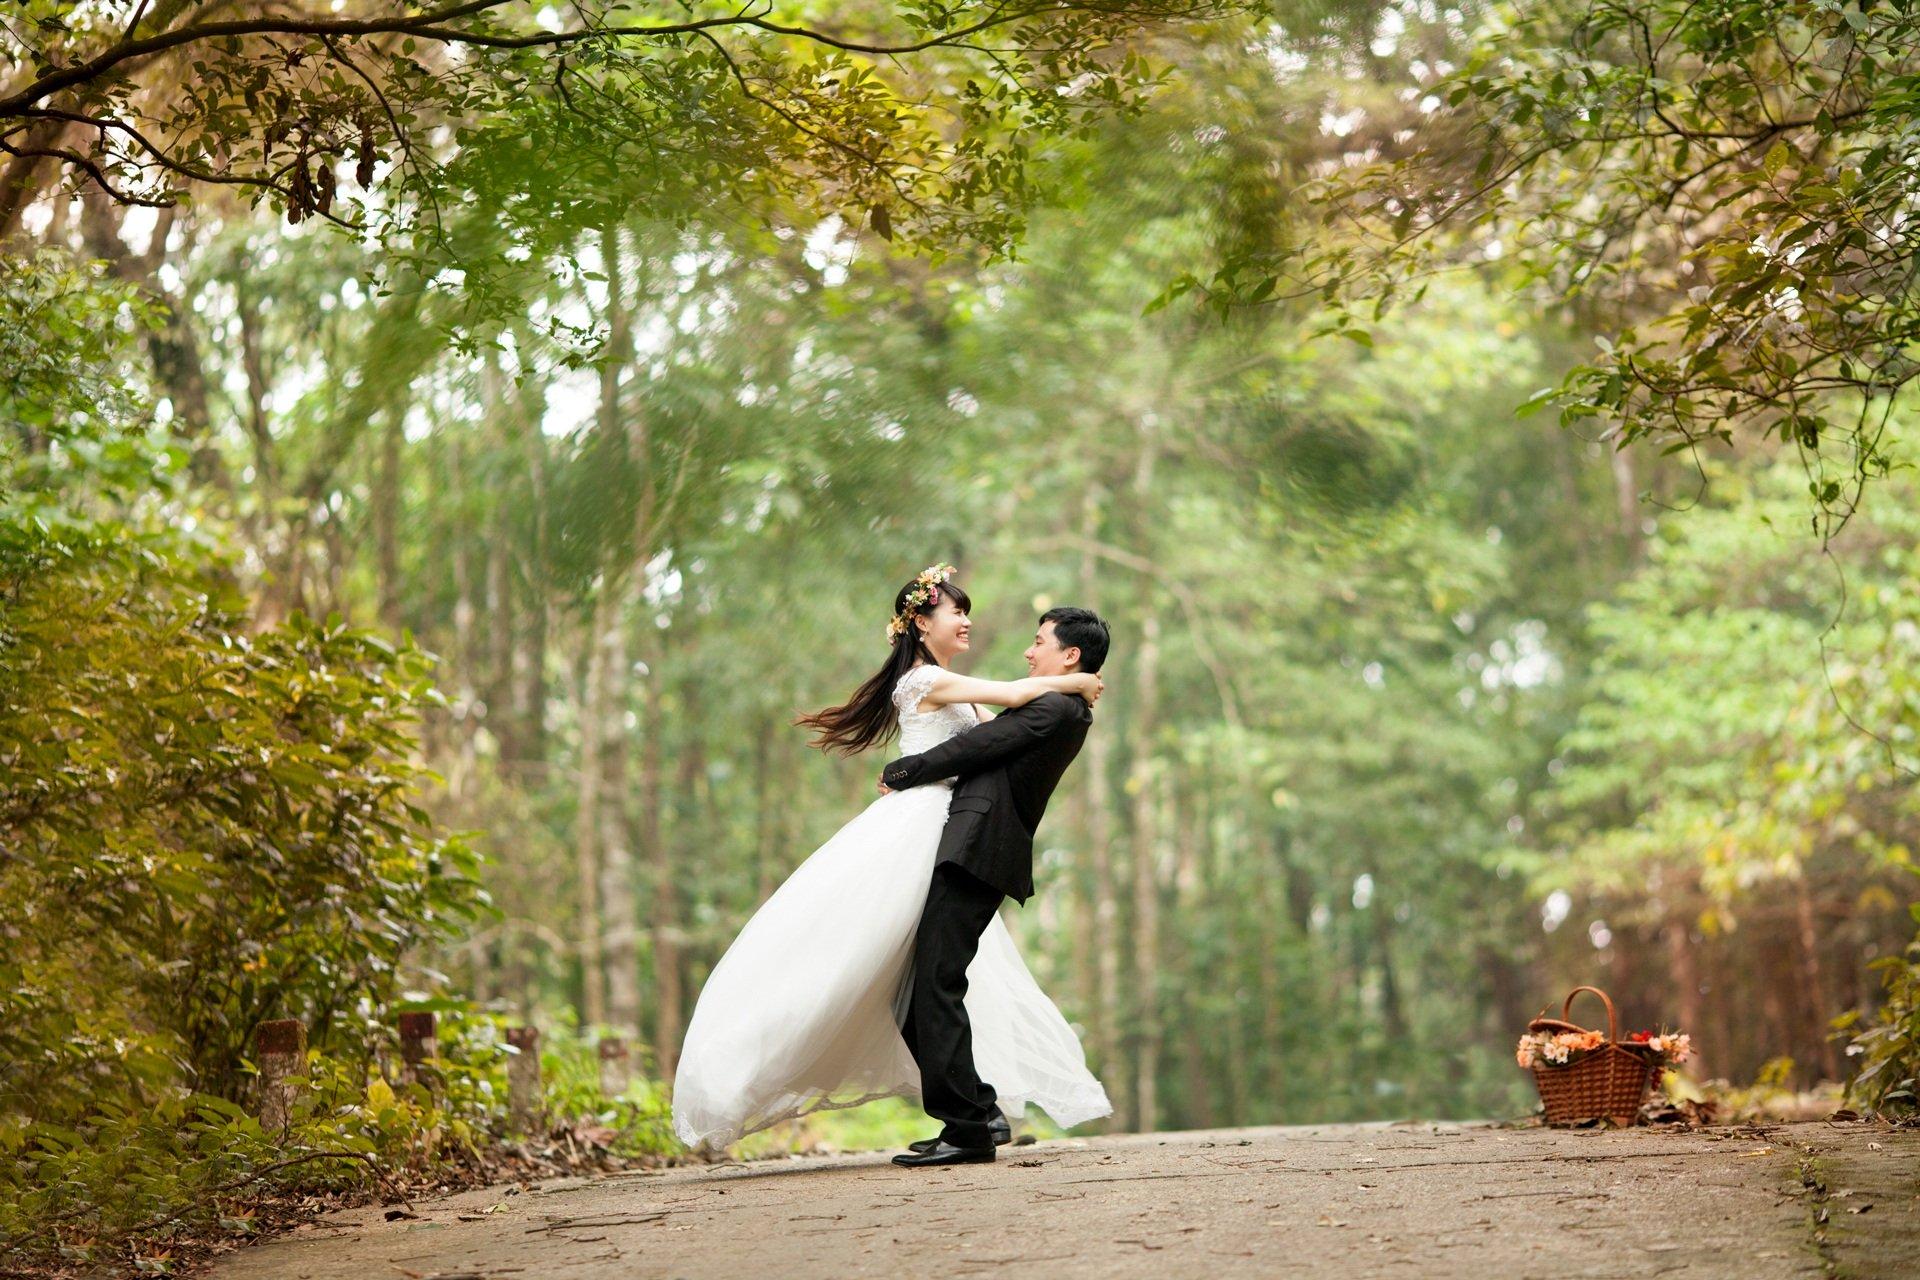 Couple Doing a Memorable Wedding Pose